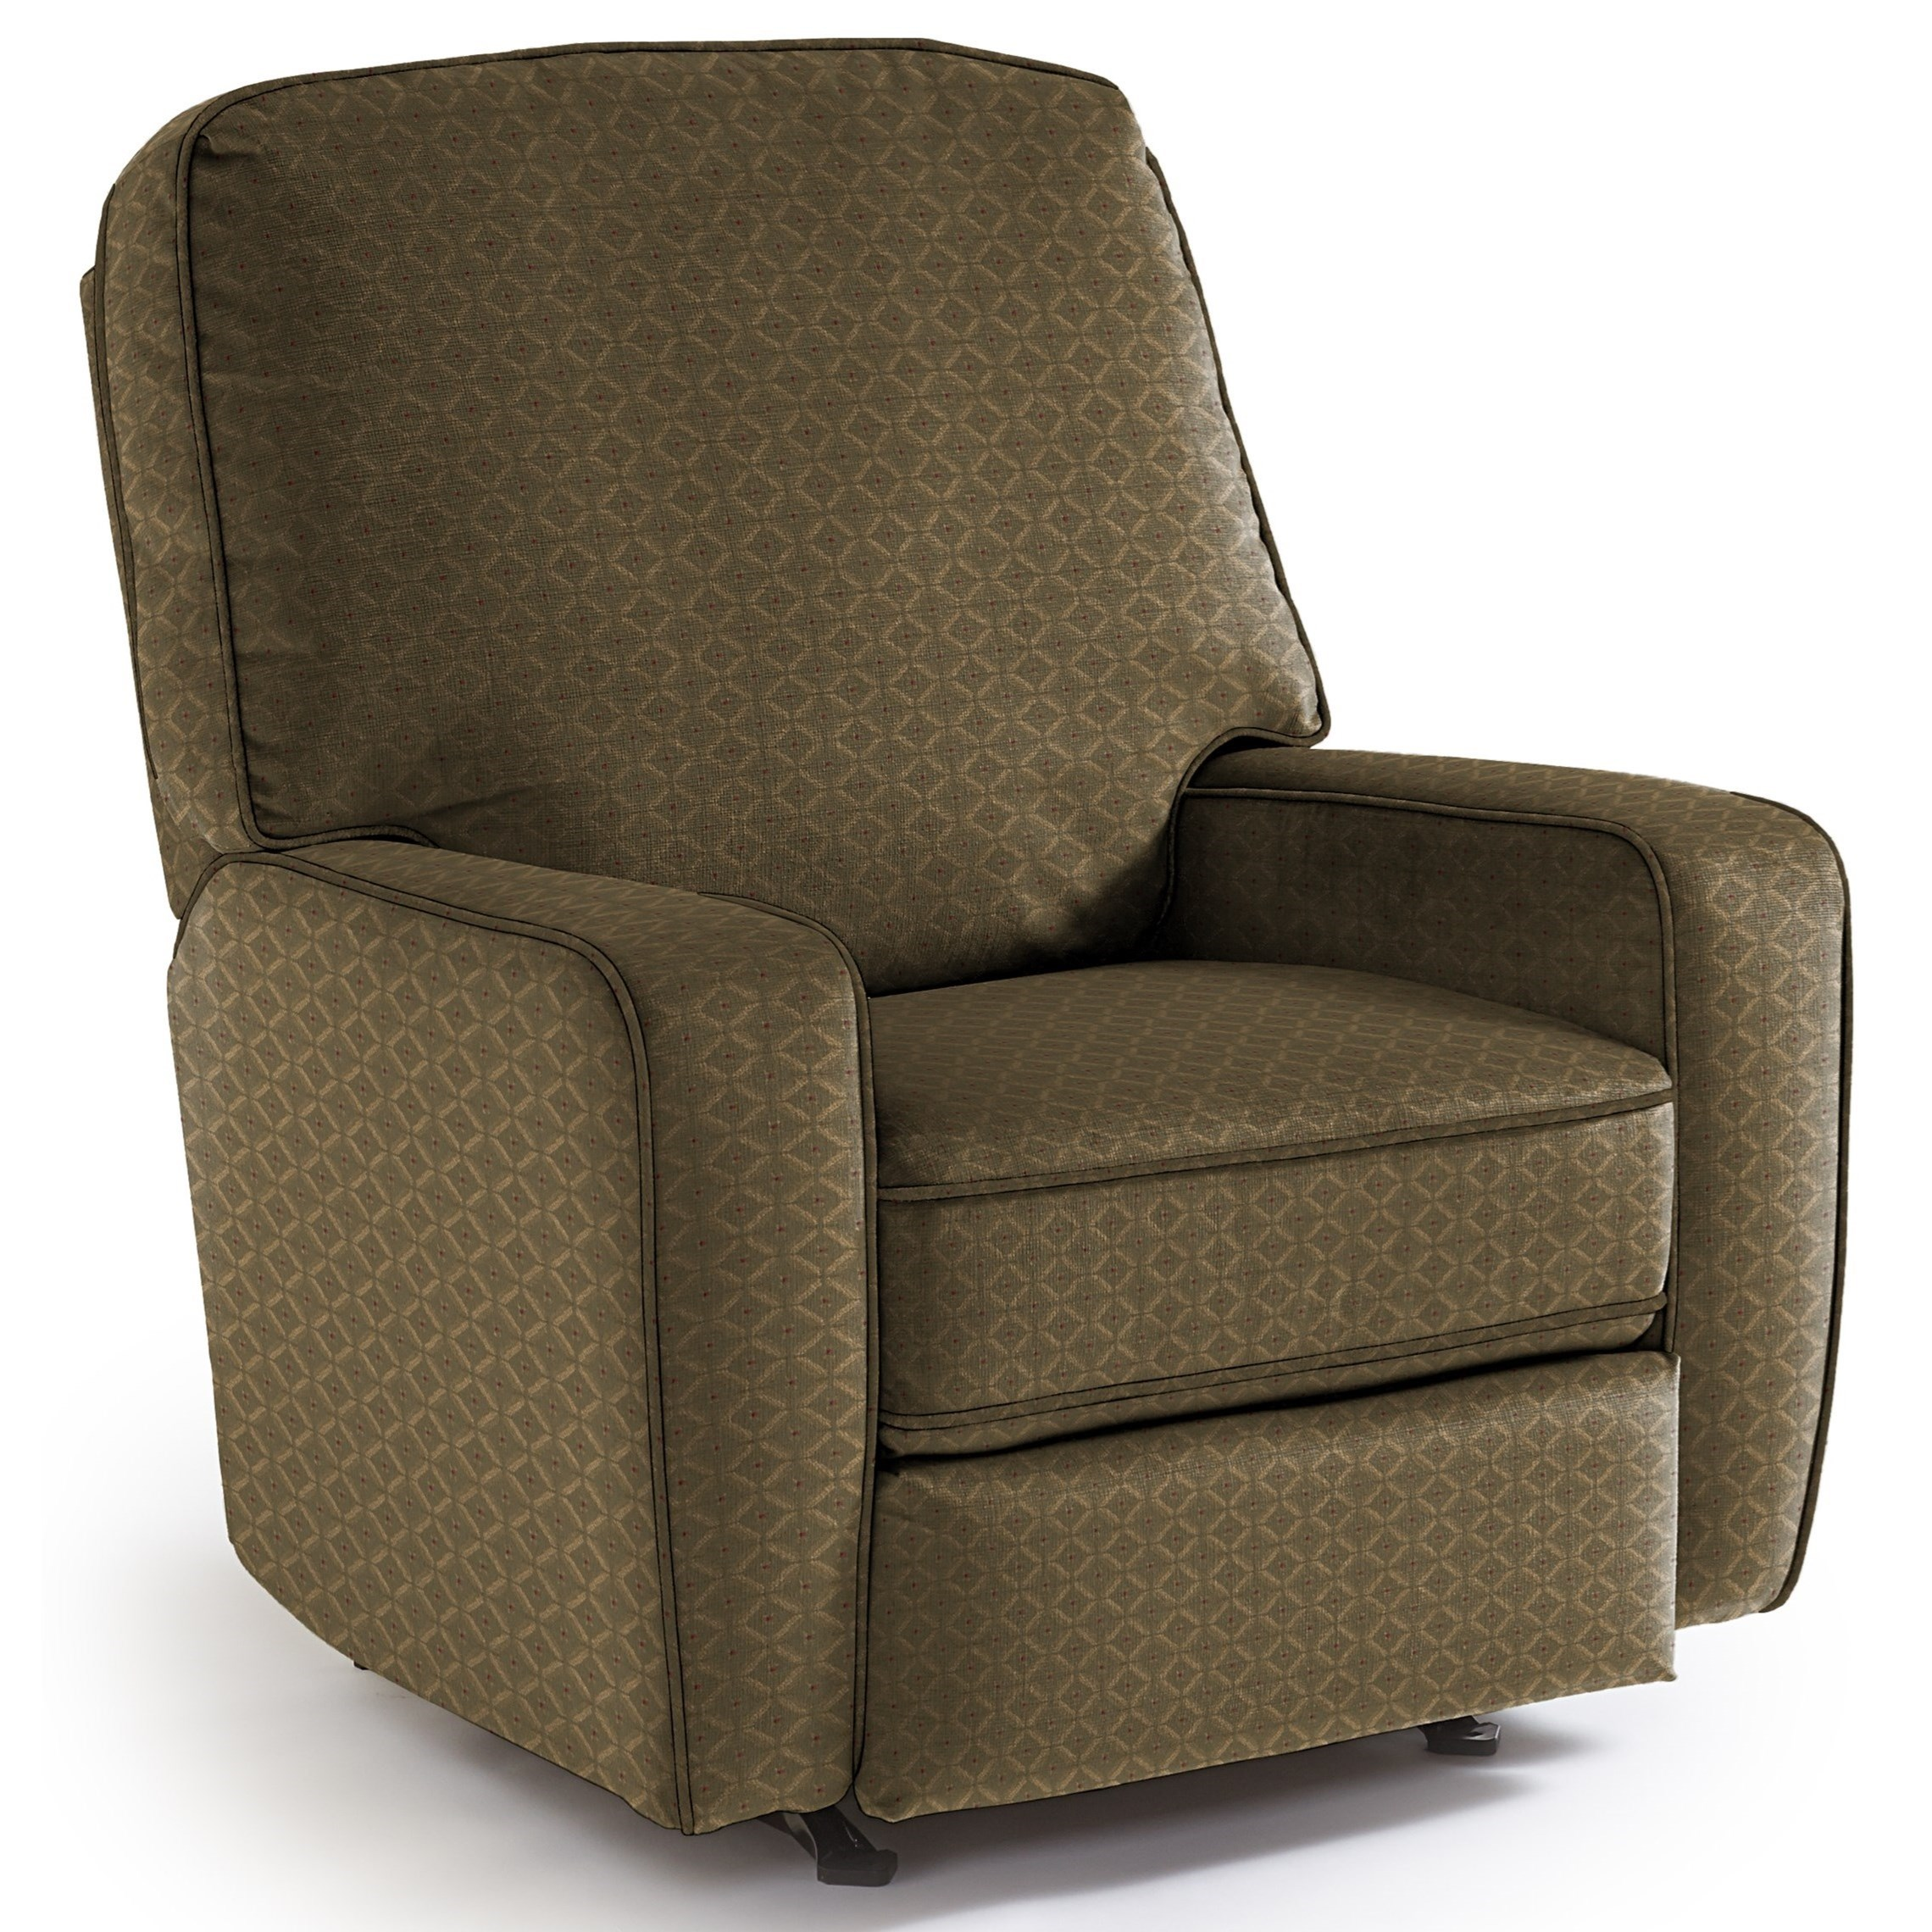 Best Home Furnishings Recliners - Medium Bilana Rocker Recliner - Item Number: 182270556-18021